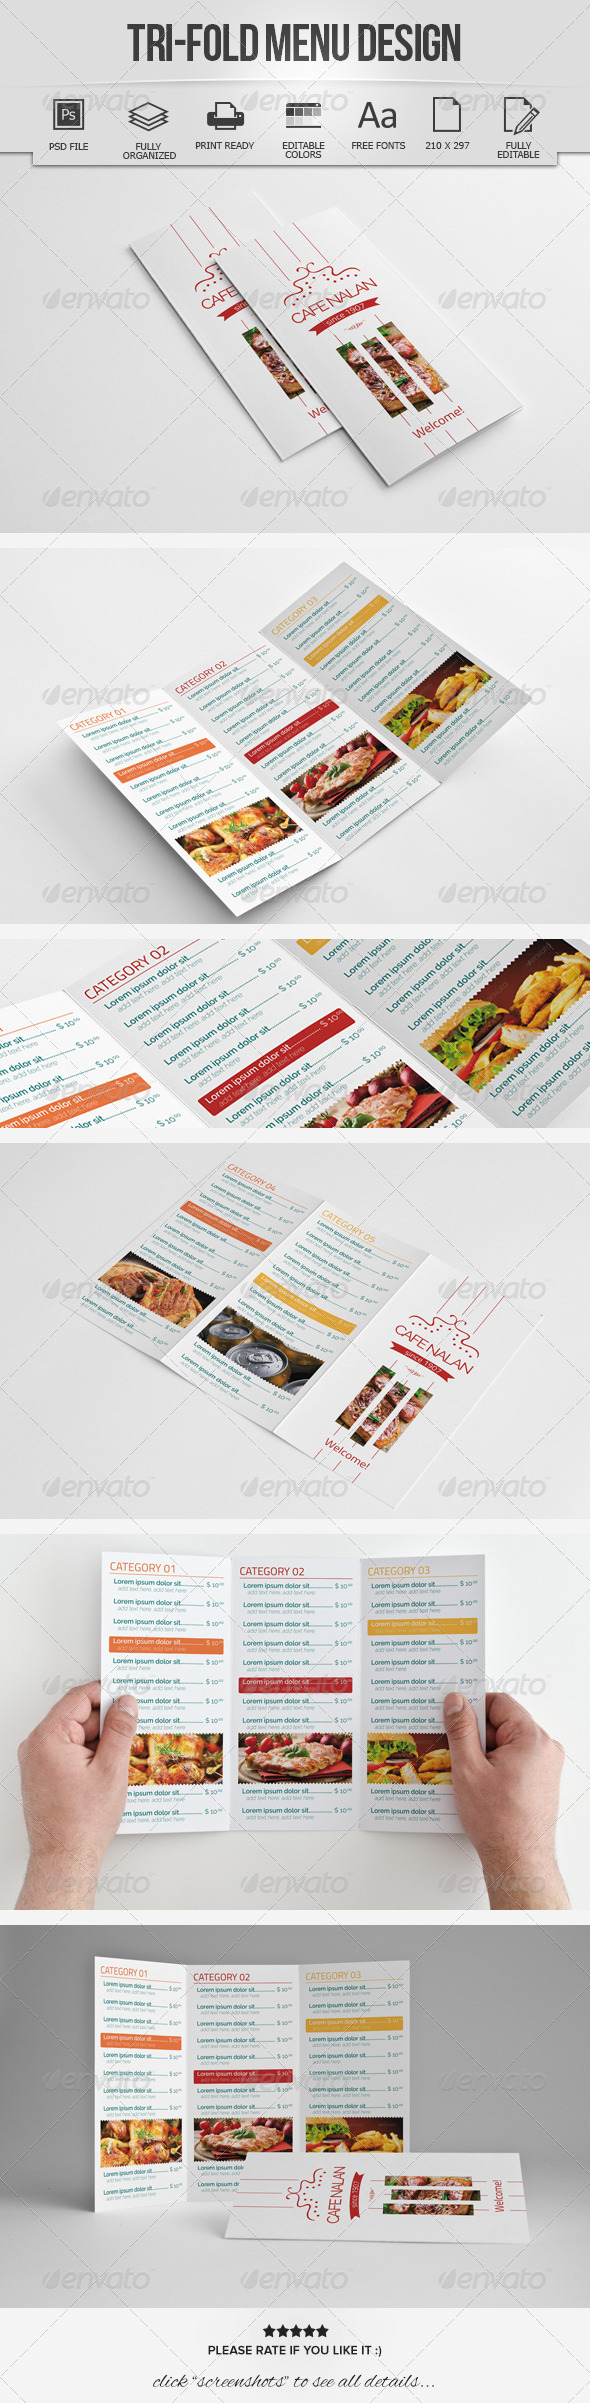 GraphicRiver Trifold Menu Design 7439754